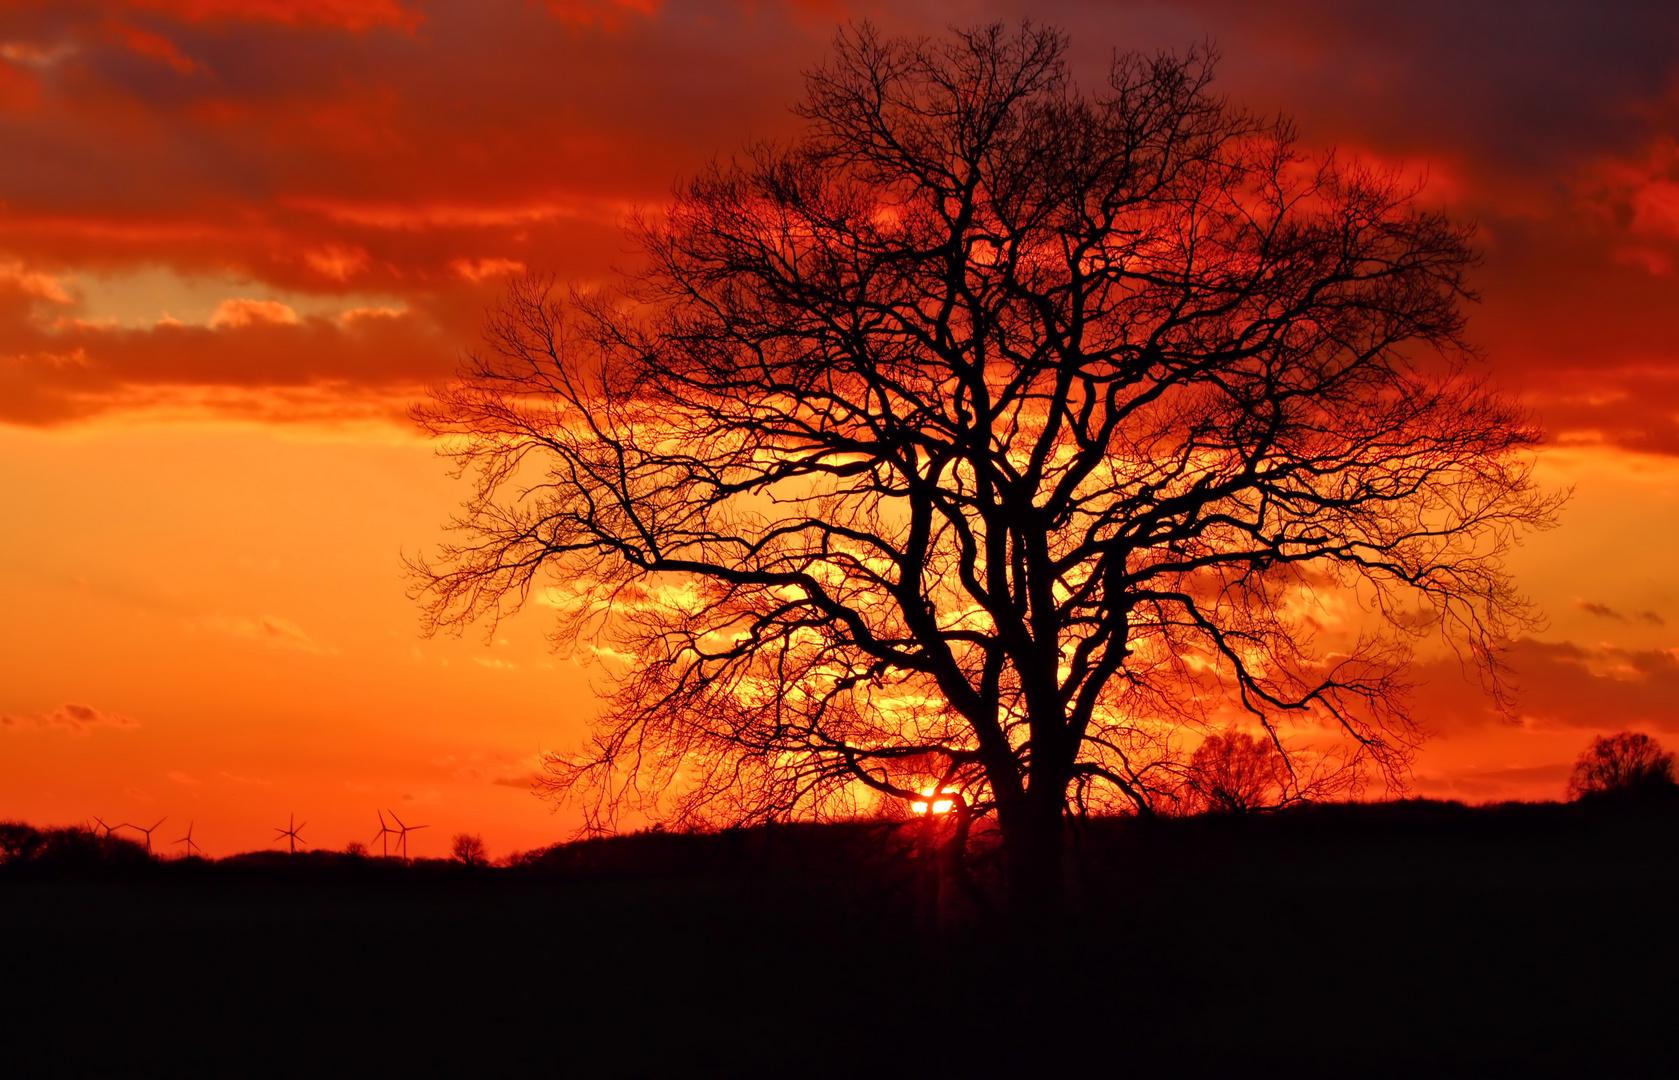 Bi uns tu hus - Sonnenuntergang heute (2)